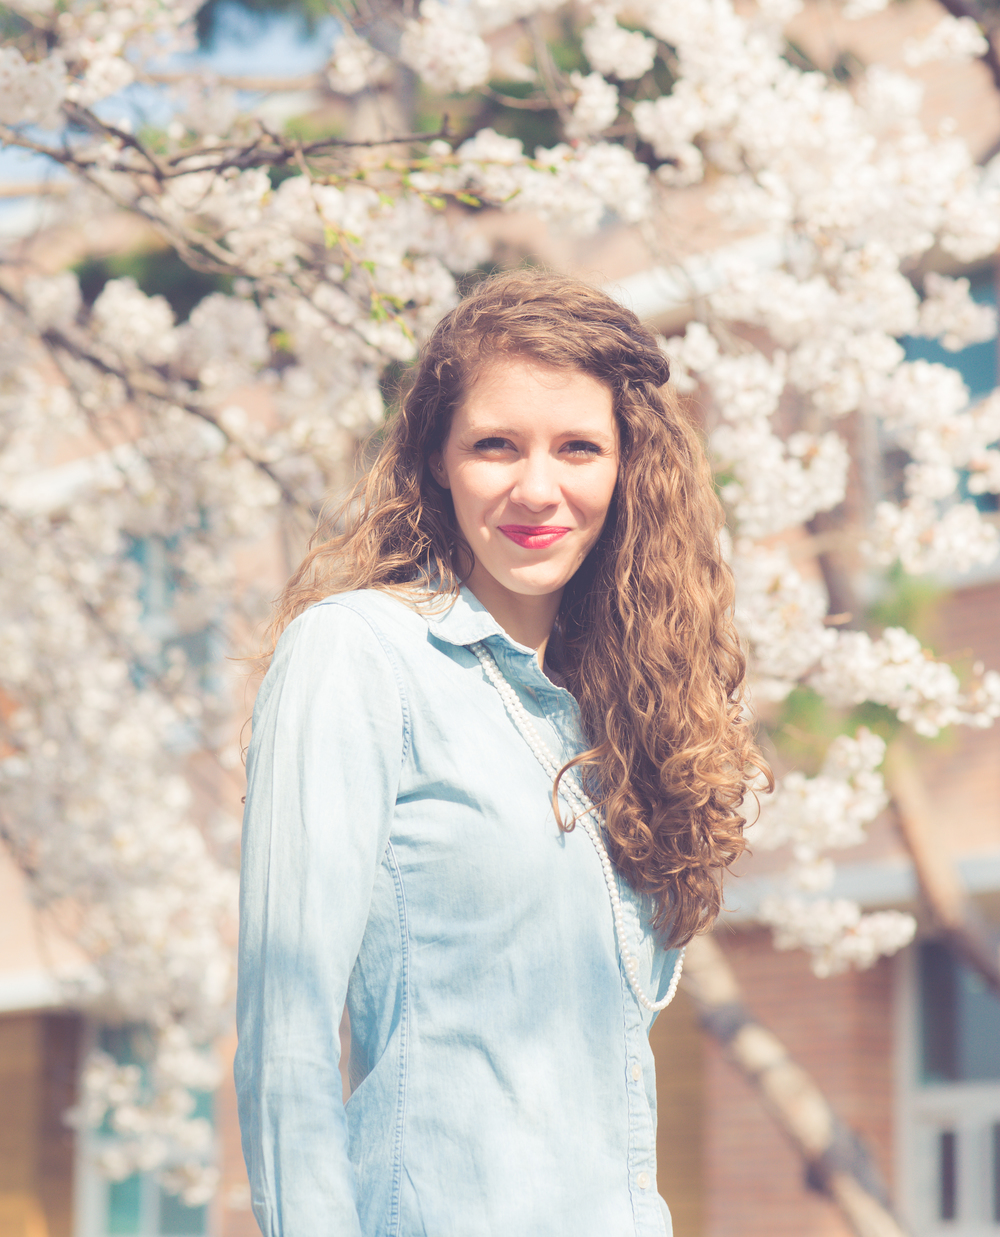 CherryBlossomStyledShootKoreaAlyshaCGSPhotography (4 of 57).jpg